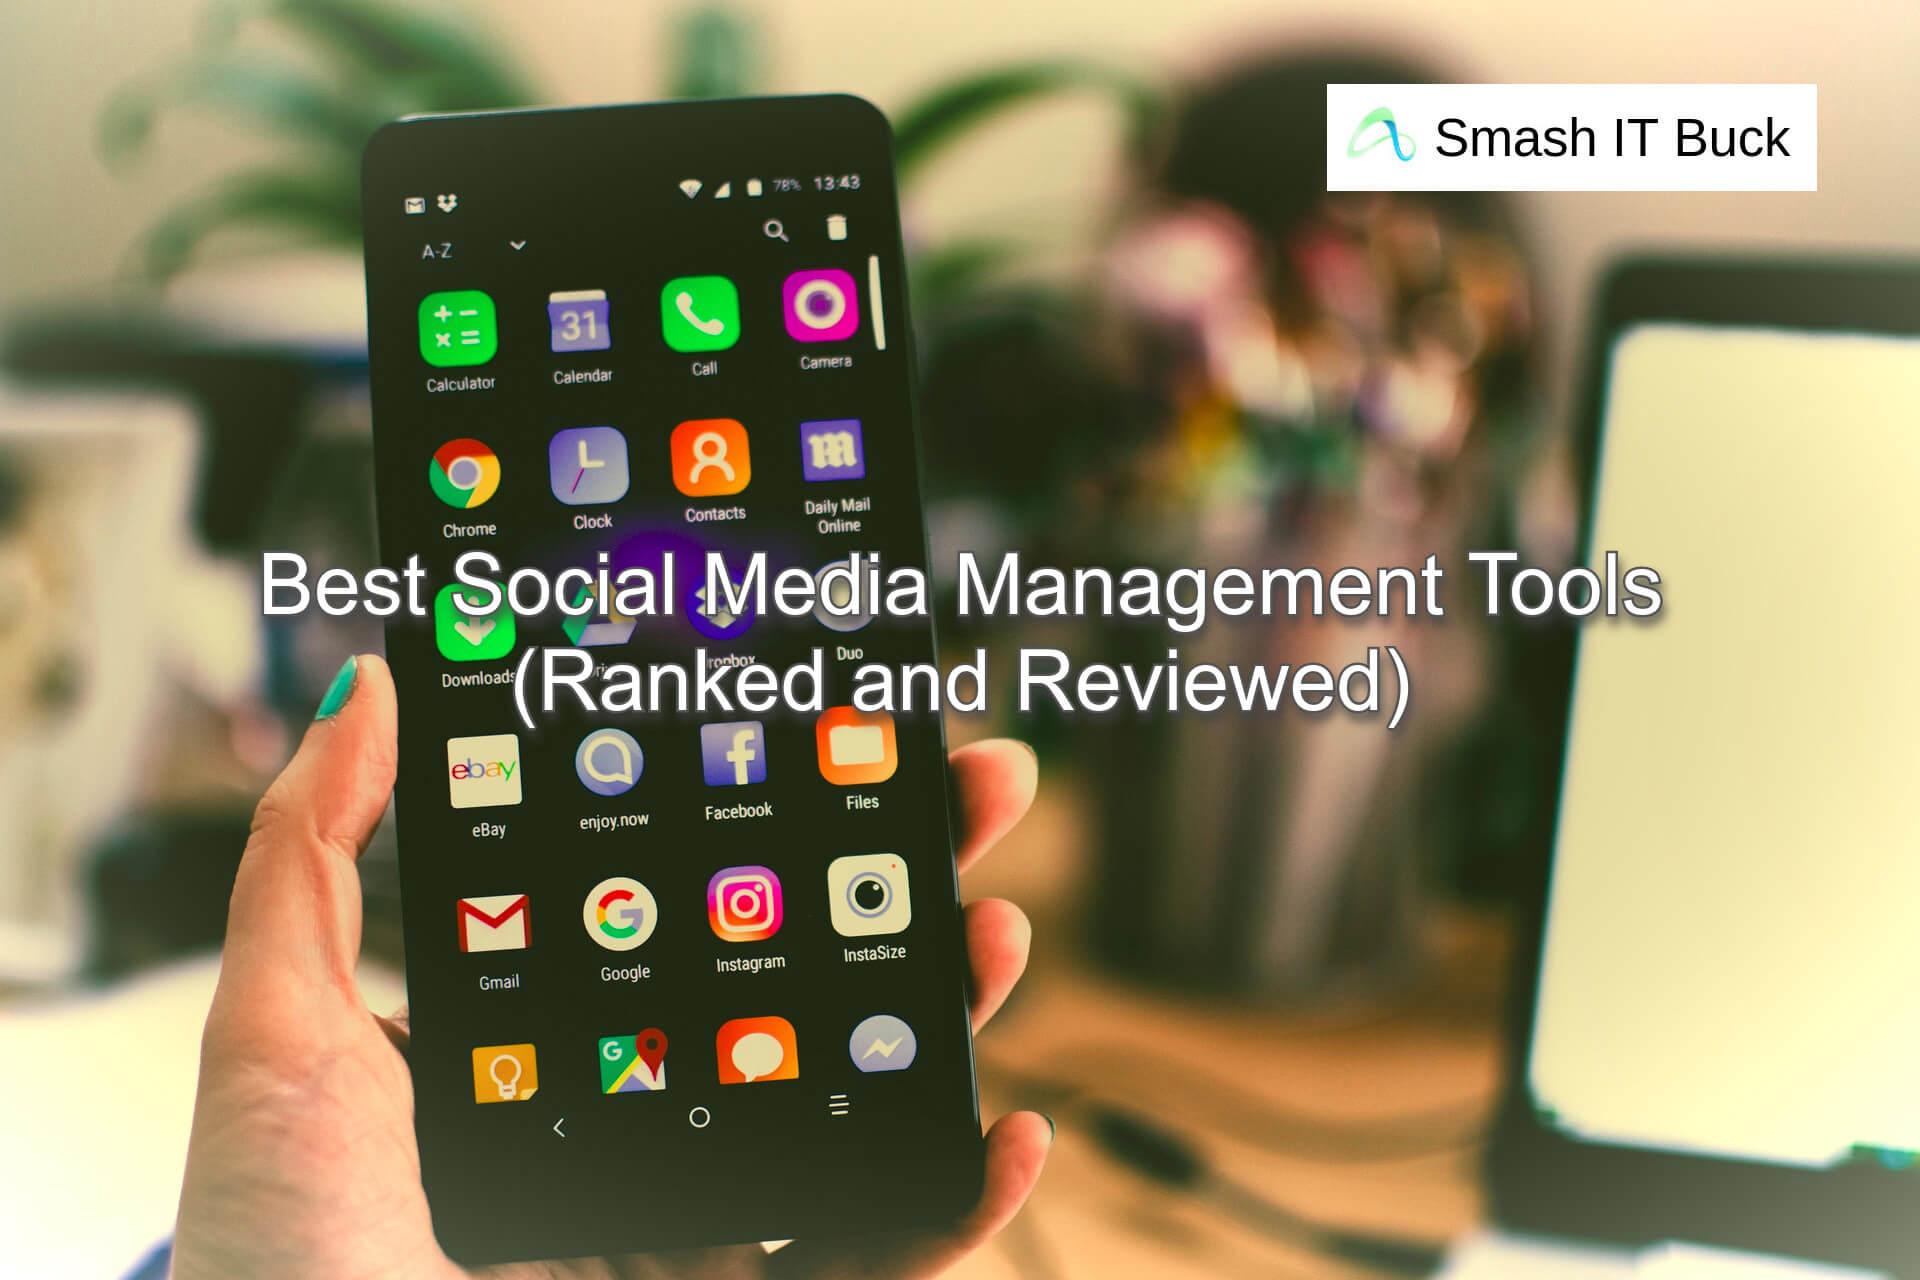 Best Social Media Management Tools in 2021